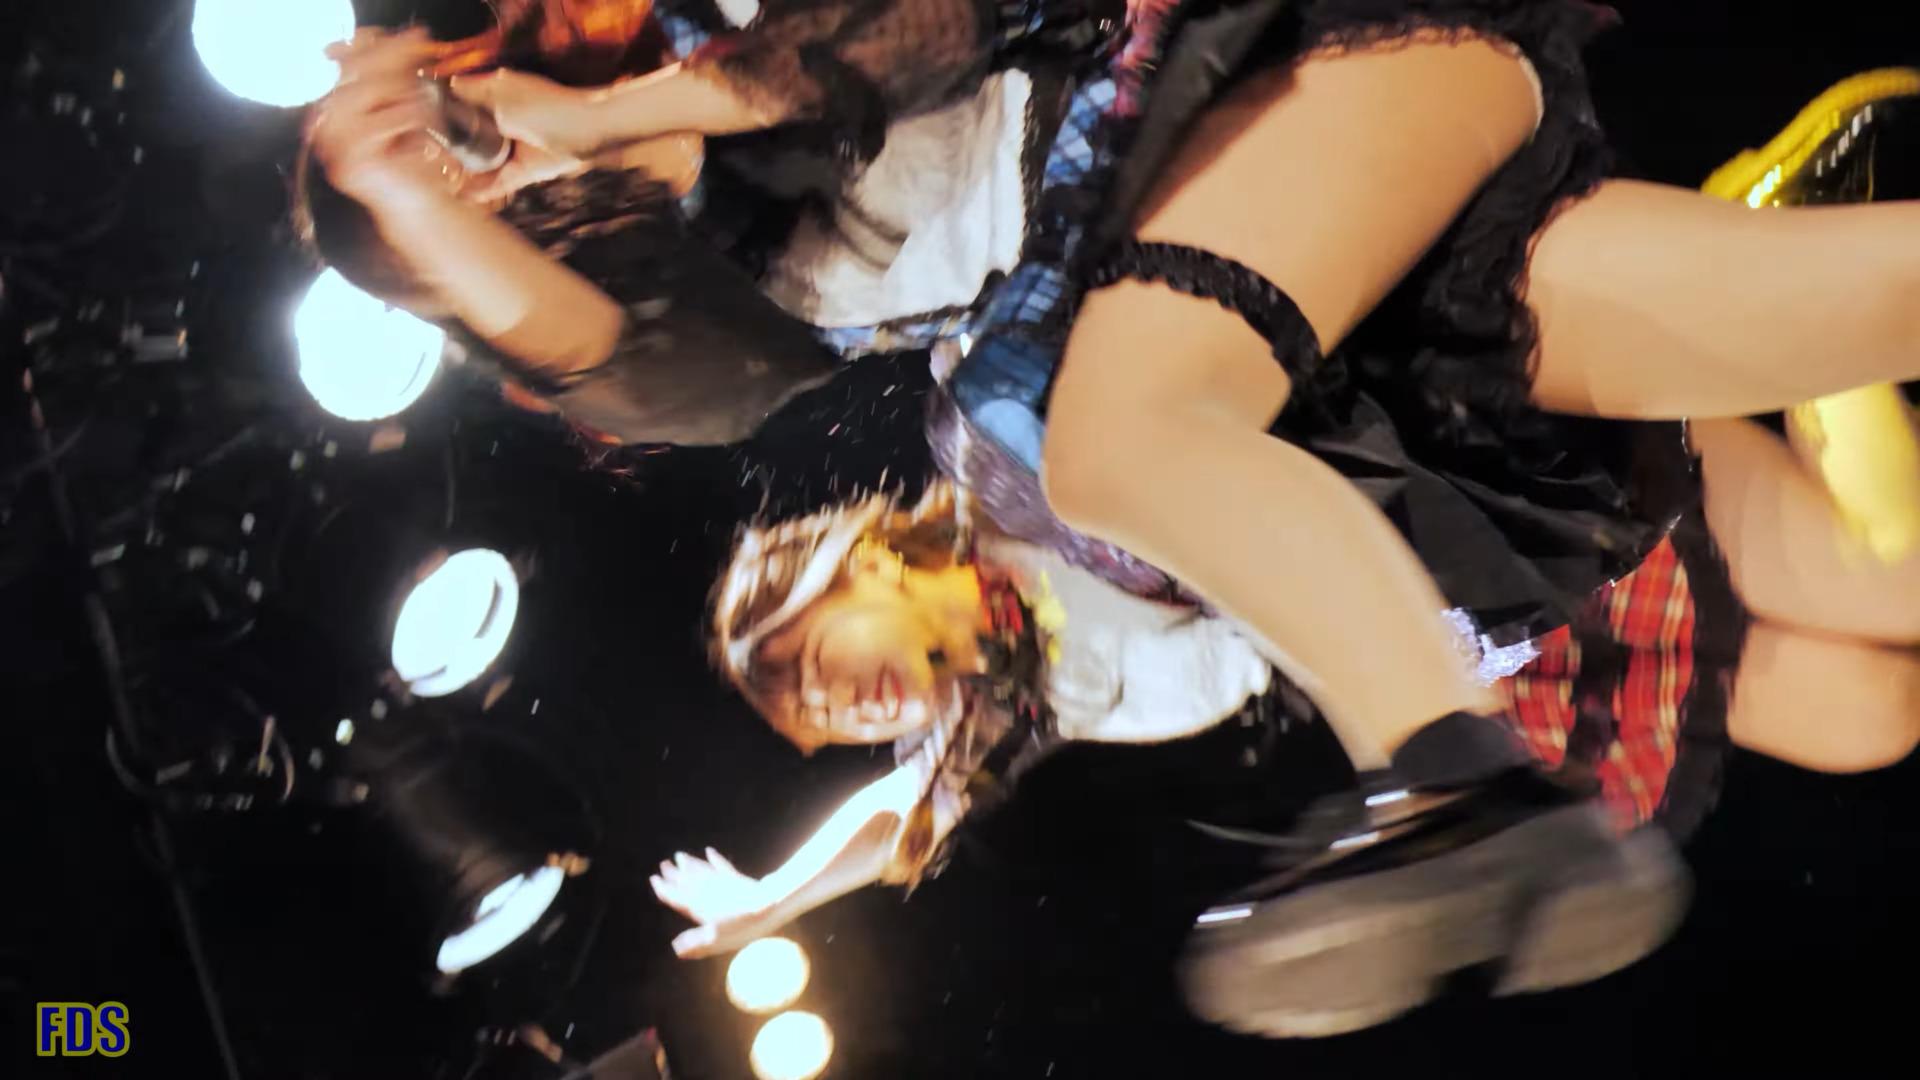 Mystear (ミスティア) 「またあした / ドキドキセンセーション」アイドル Japanese girls Idol group [4K] 05:34